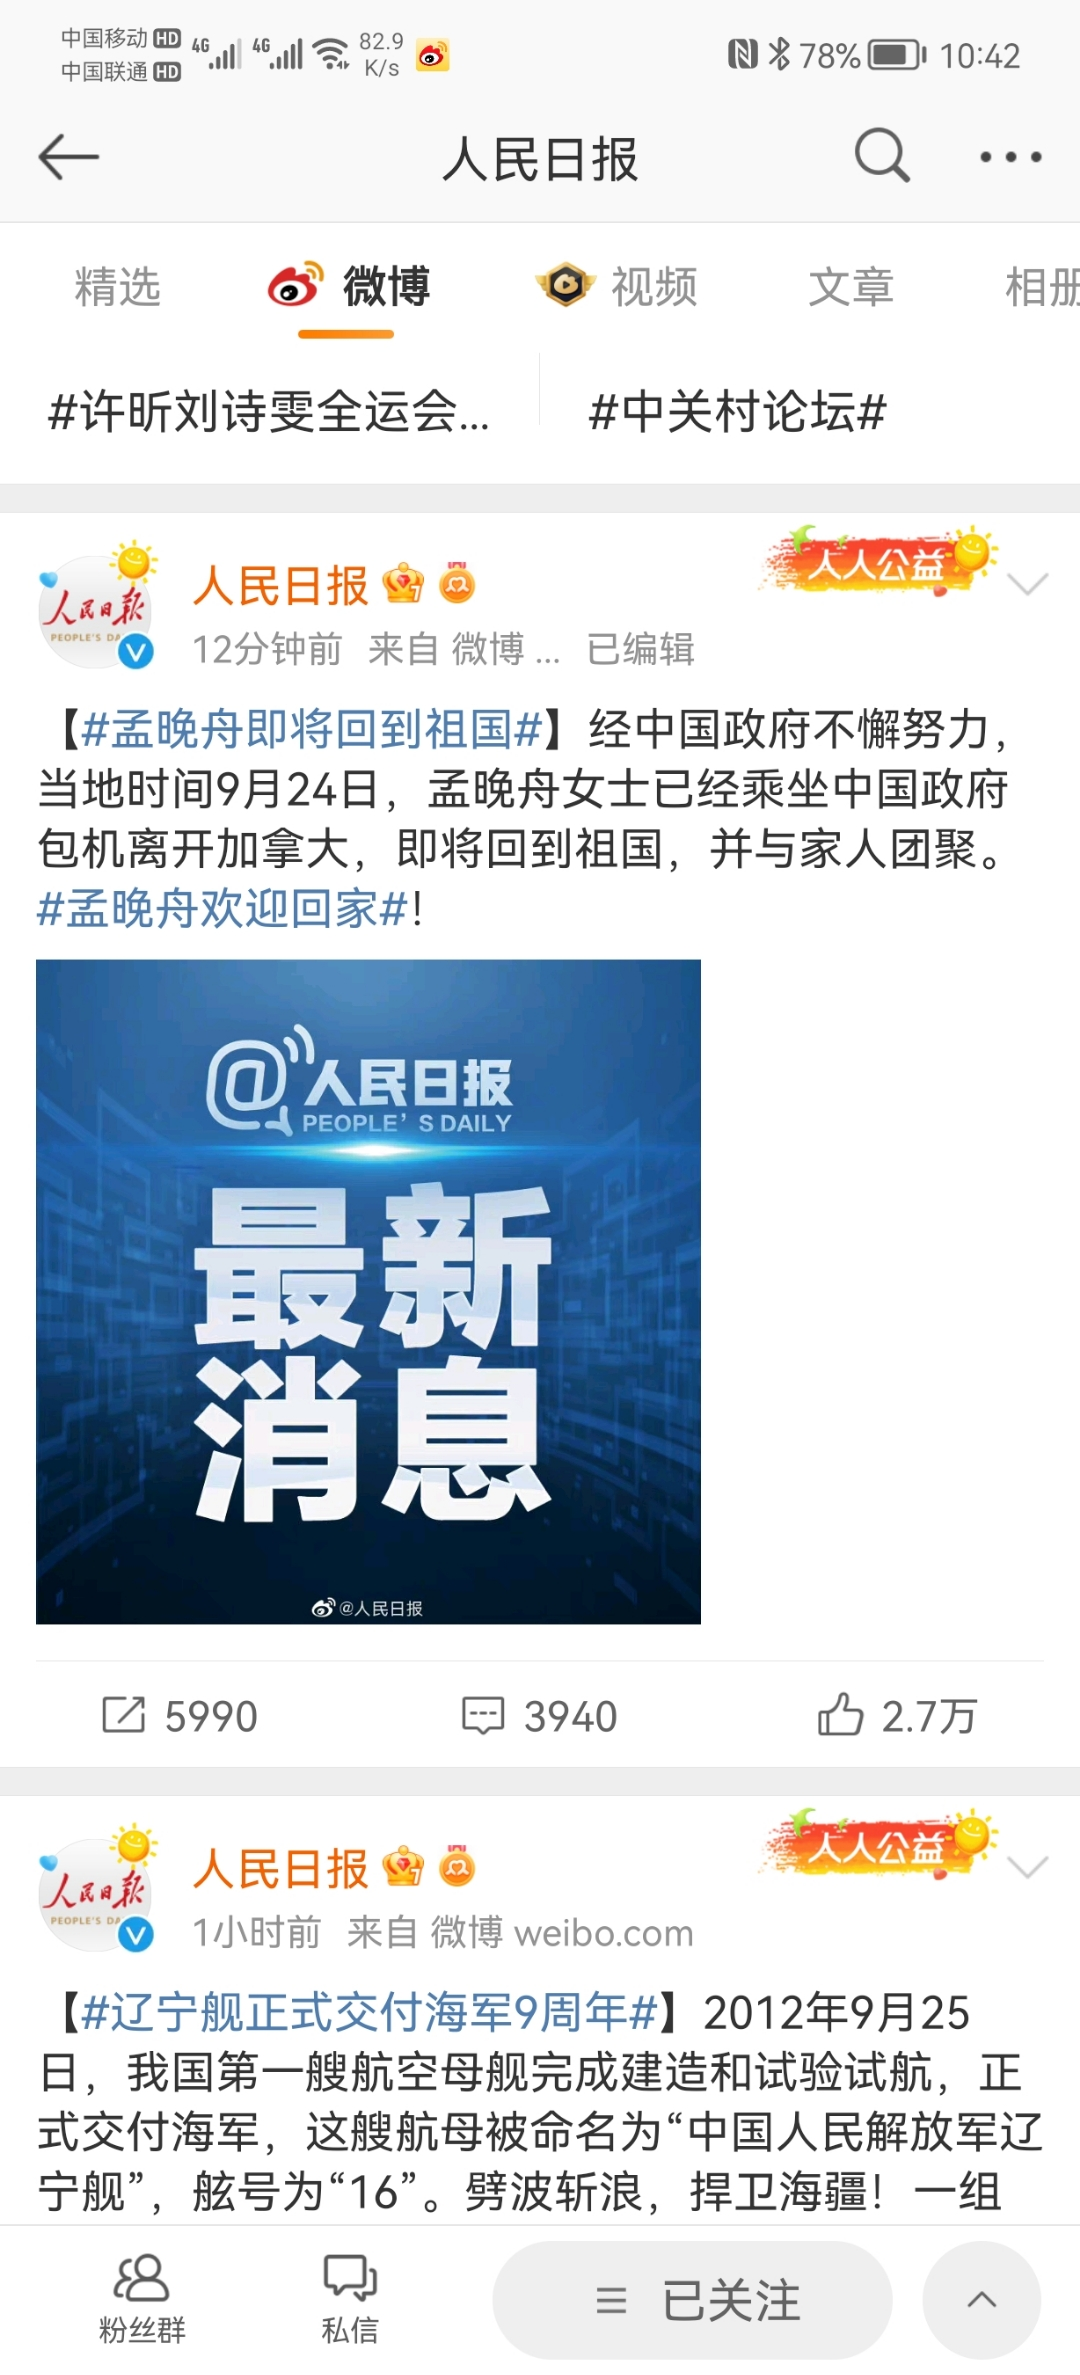 Screenshot_20210925_104231_com.sina.weibo.jpg